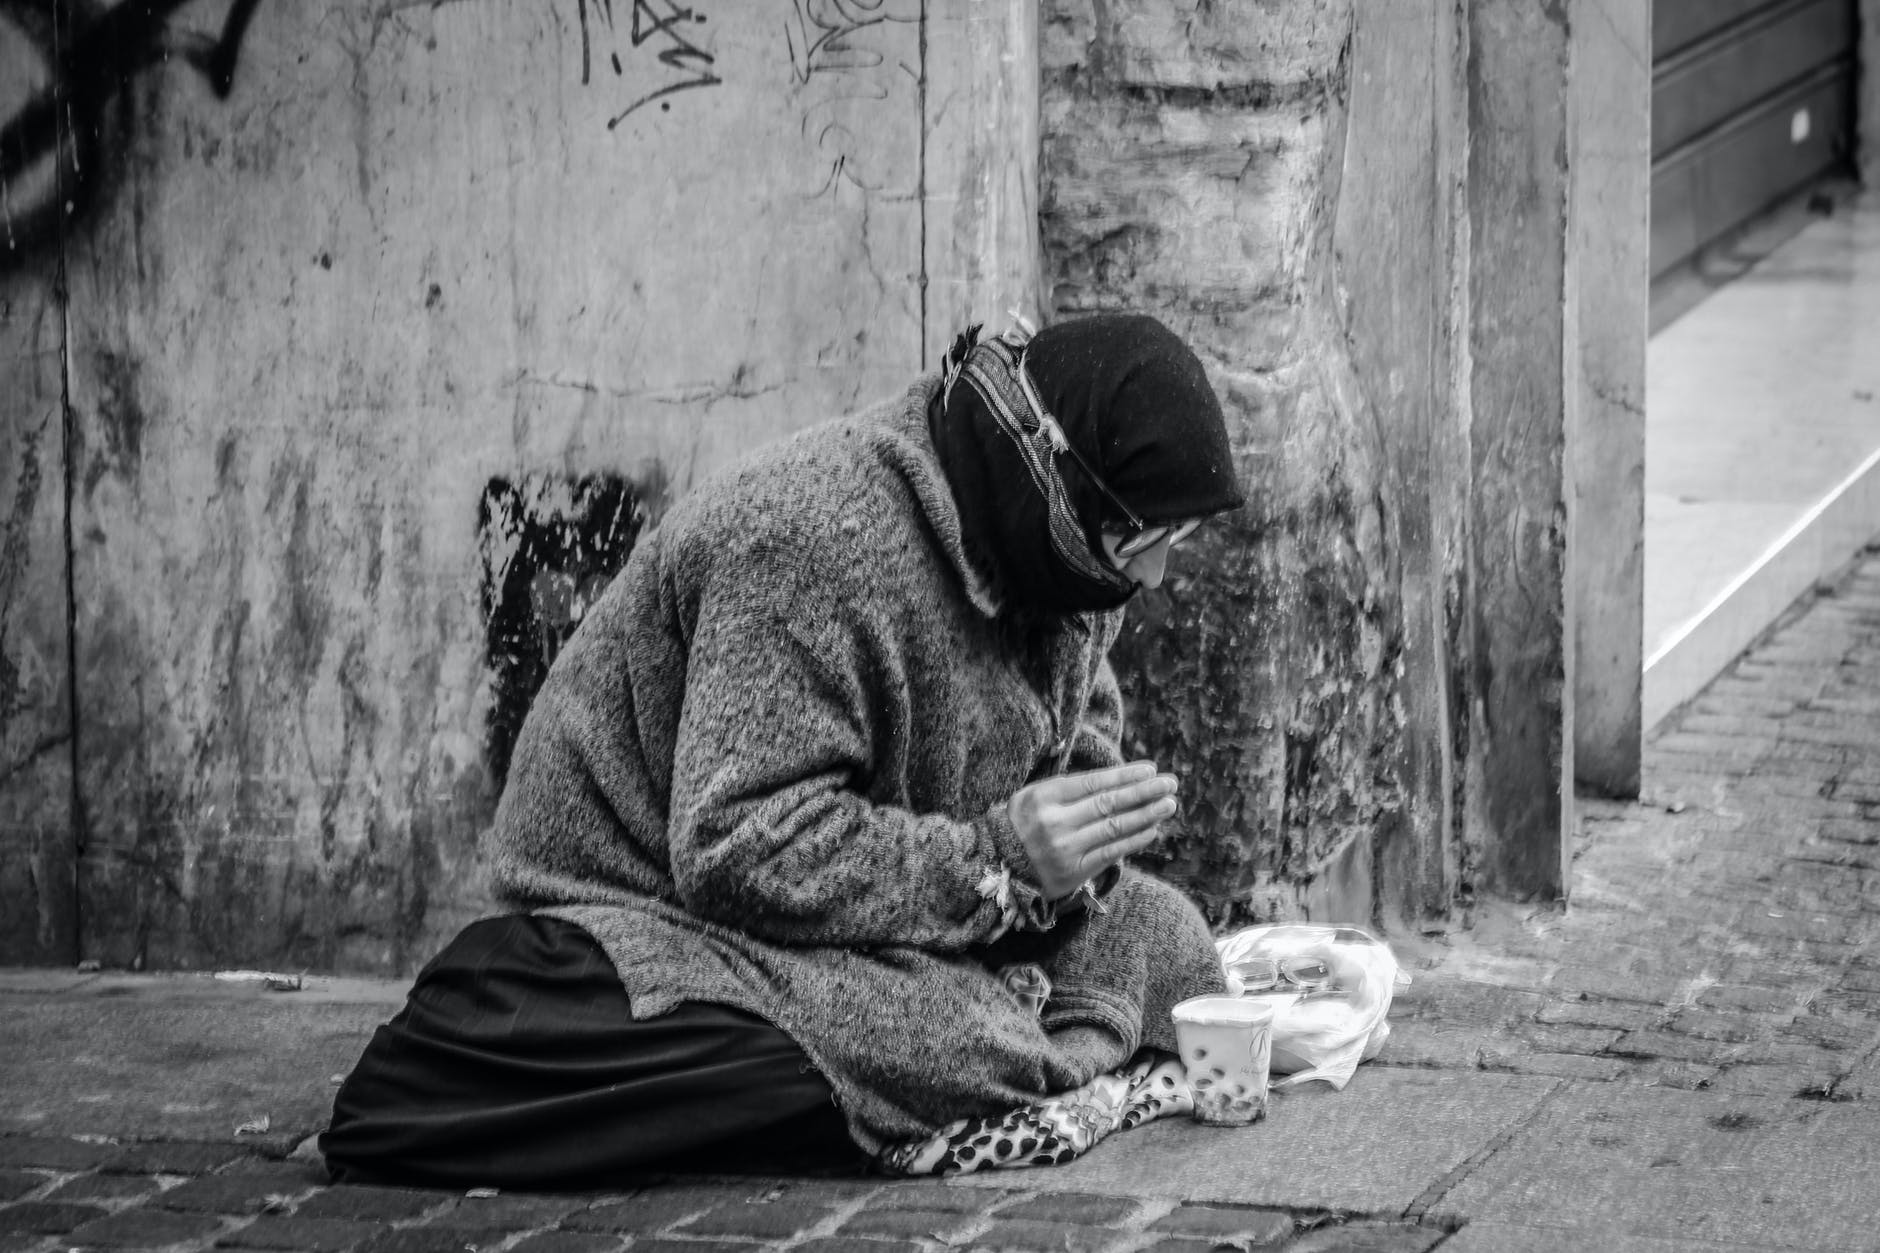 homeless-senzatetto-clochard